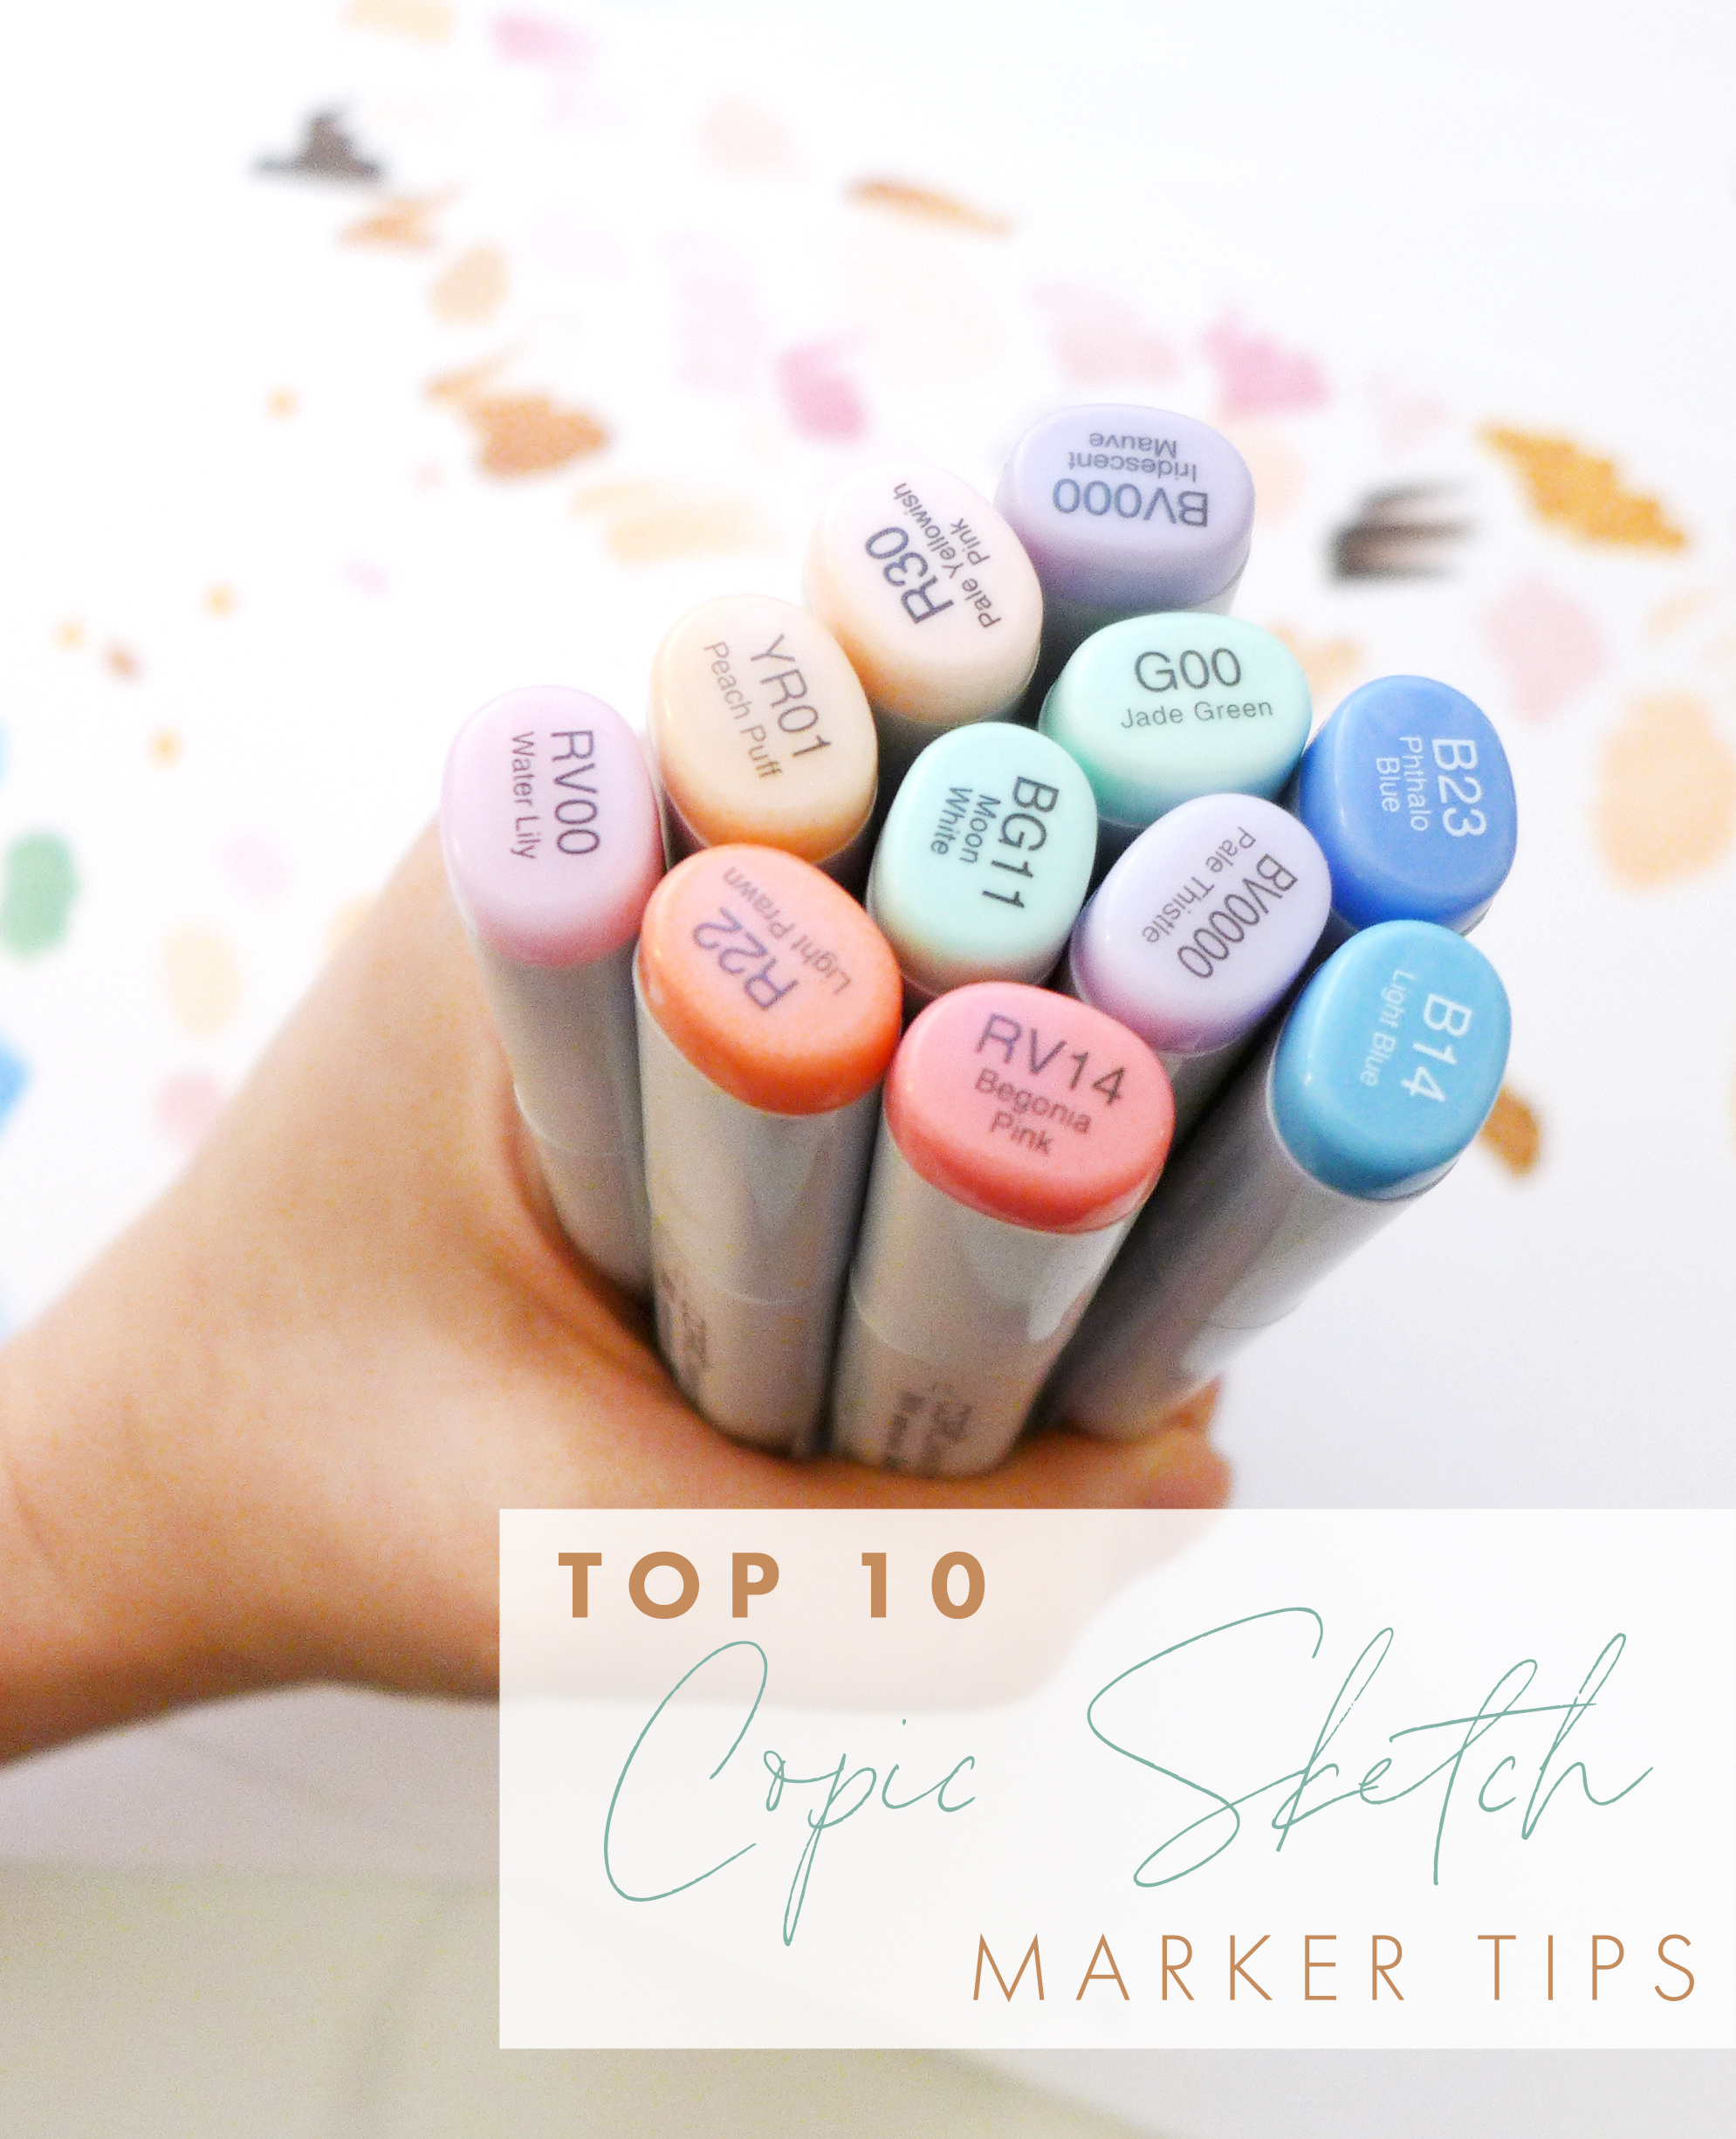 Joanna Baker Illustration Top 10 Copic Sketch Marker Tips